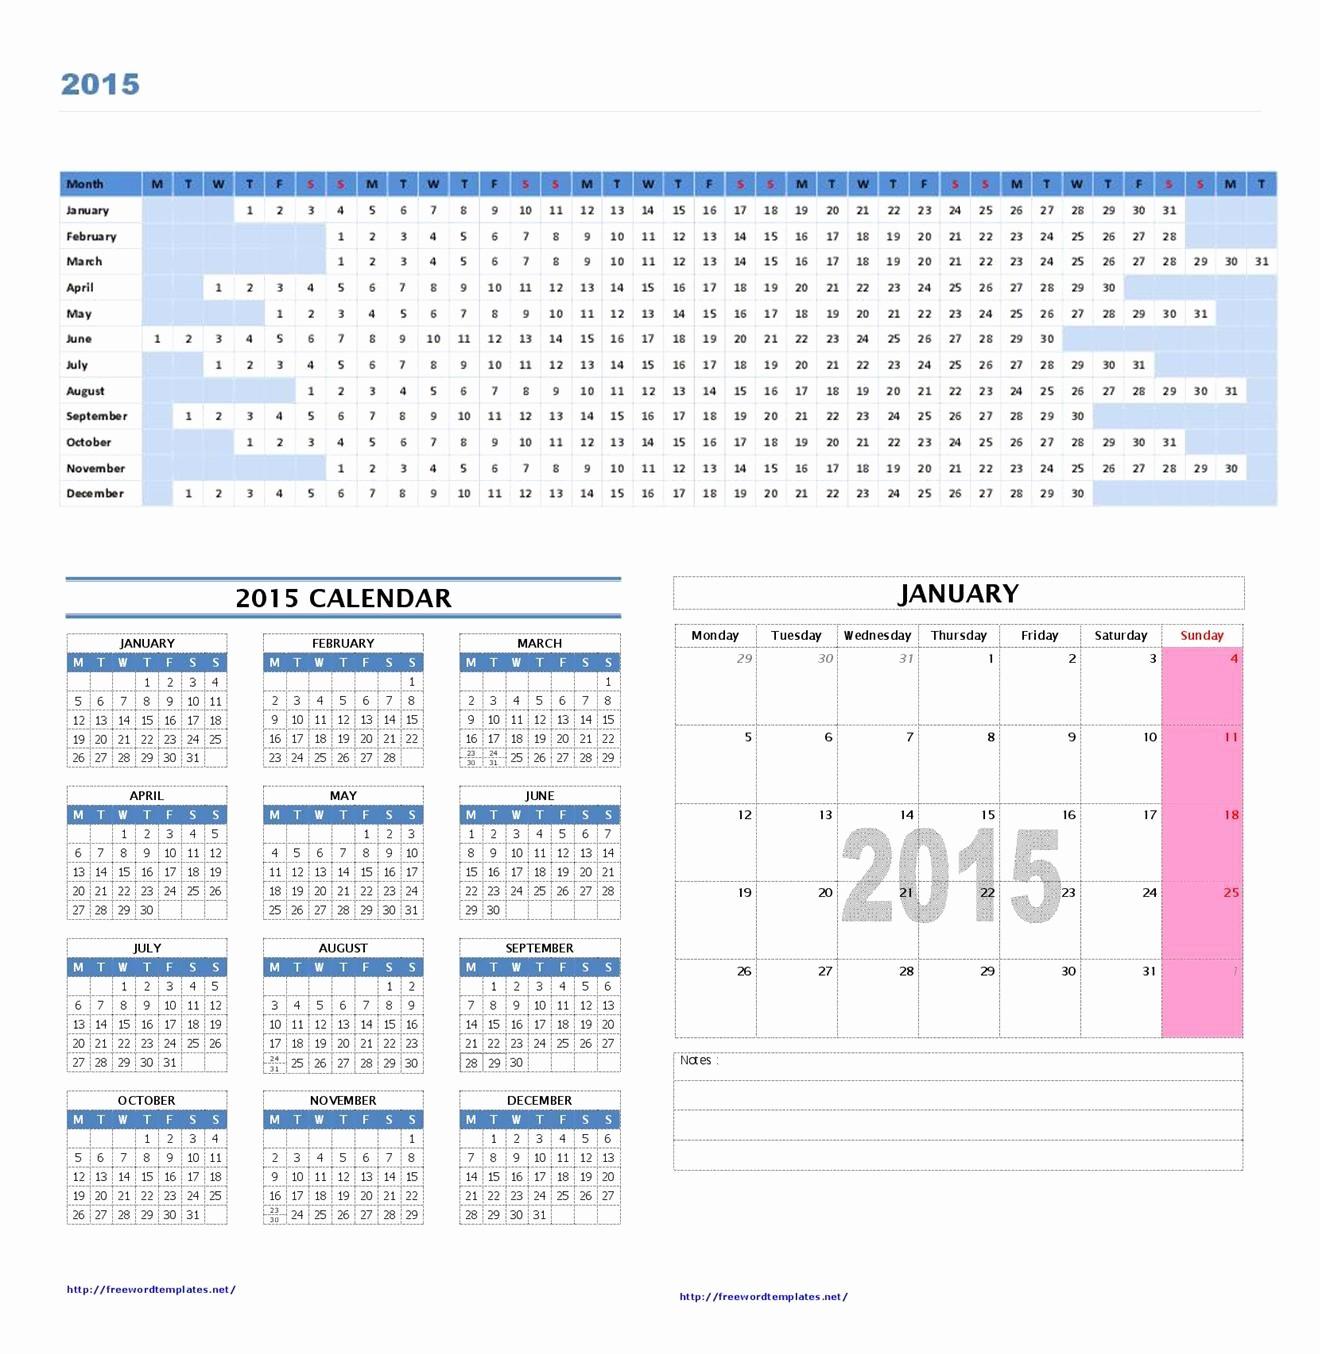 Calendar Templates for Ms Word Lovely 2015 Calendar Templates